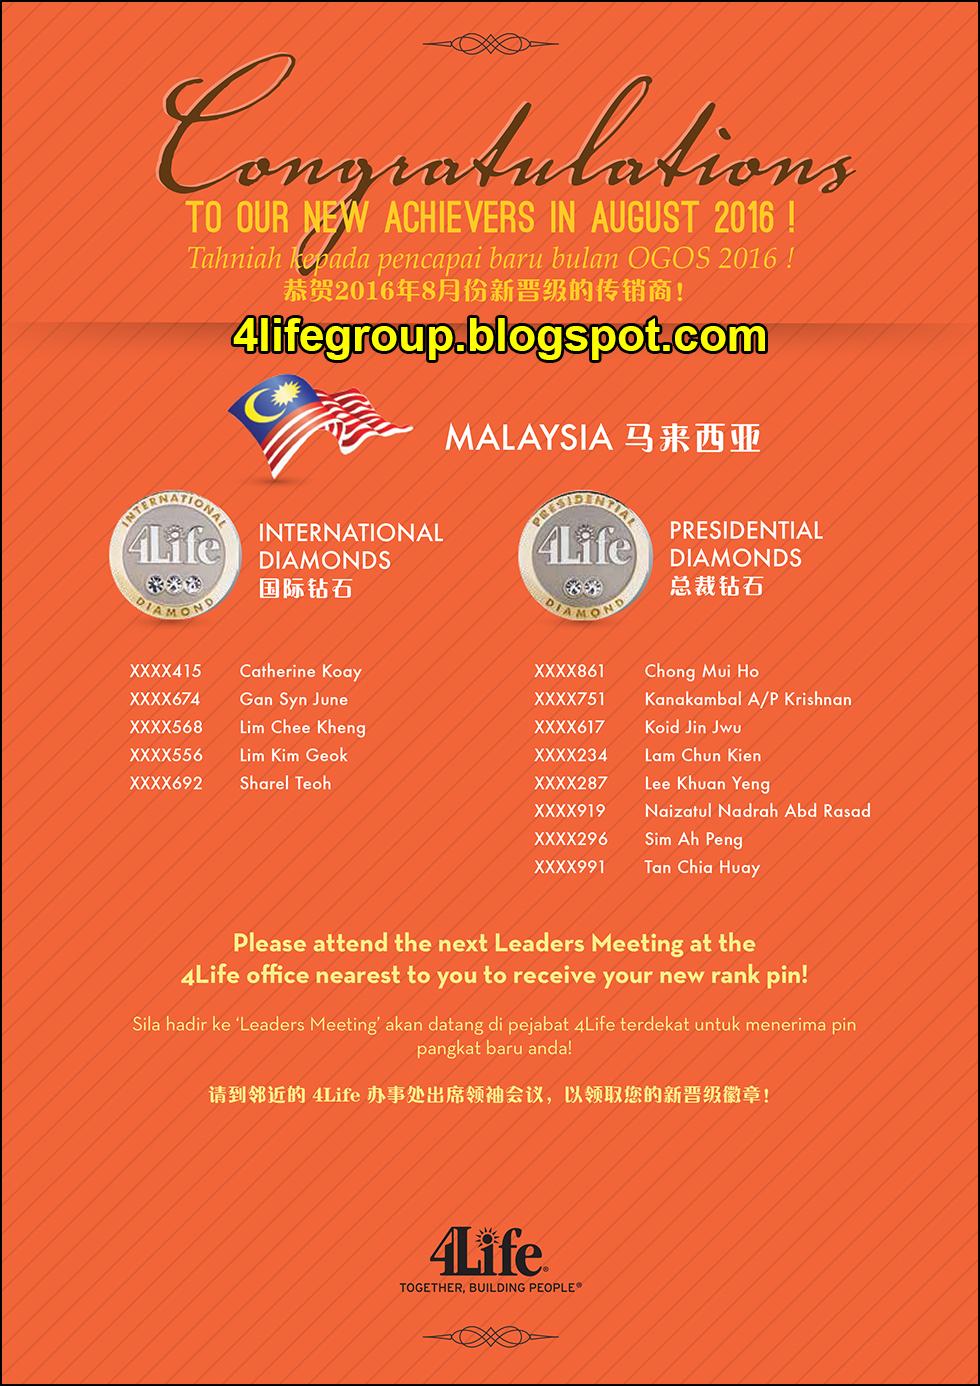 foto Pencapai Pangkat Baru Ogos 2016 4Life Malaysia (1)